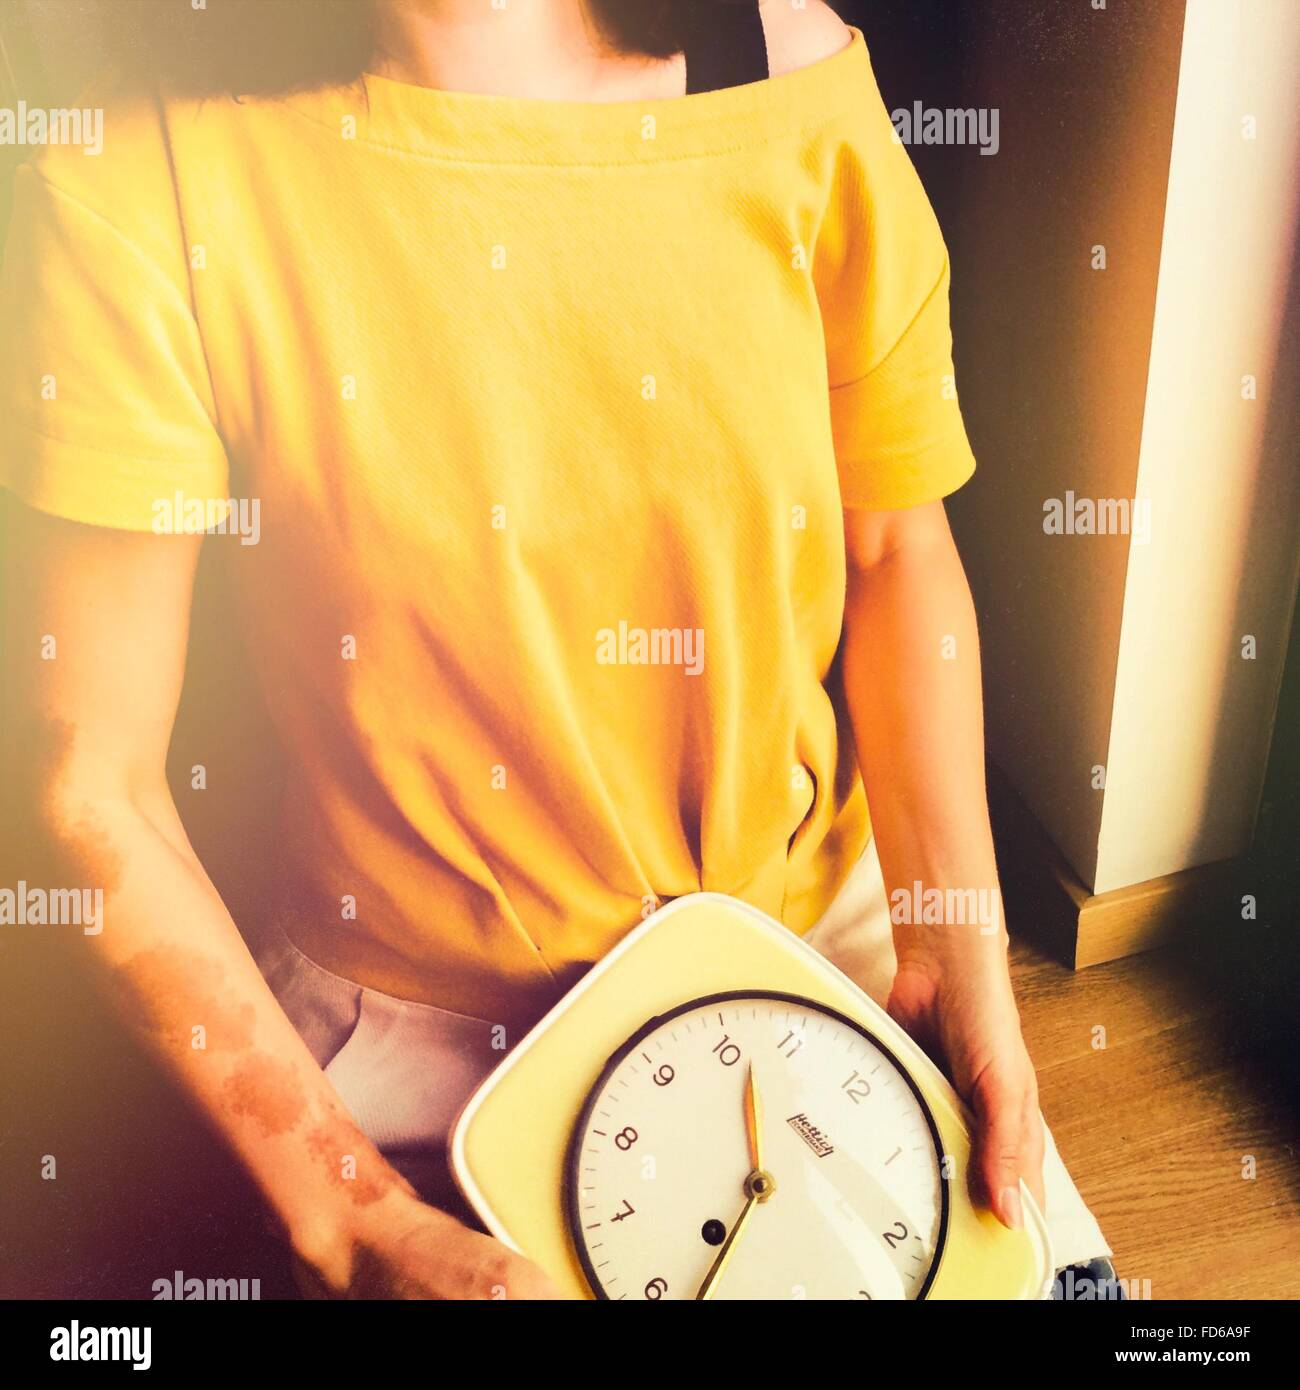 Femme tenant une horloge Photo Stock